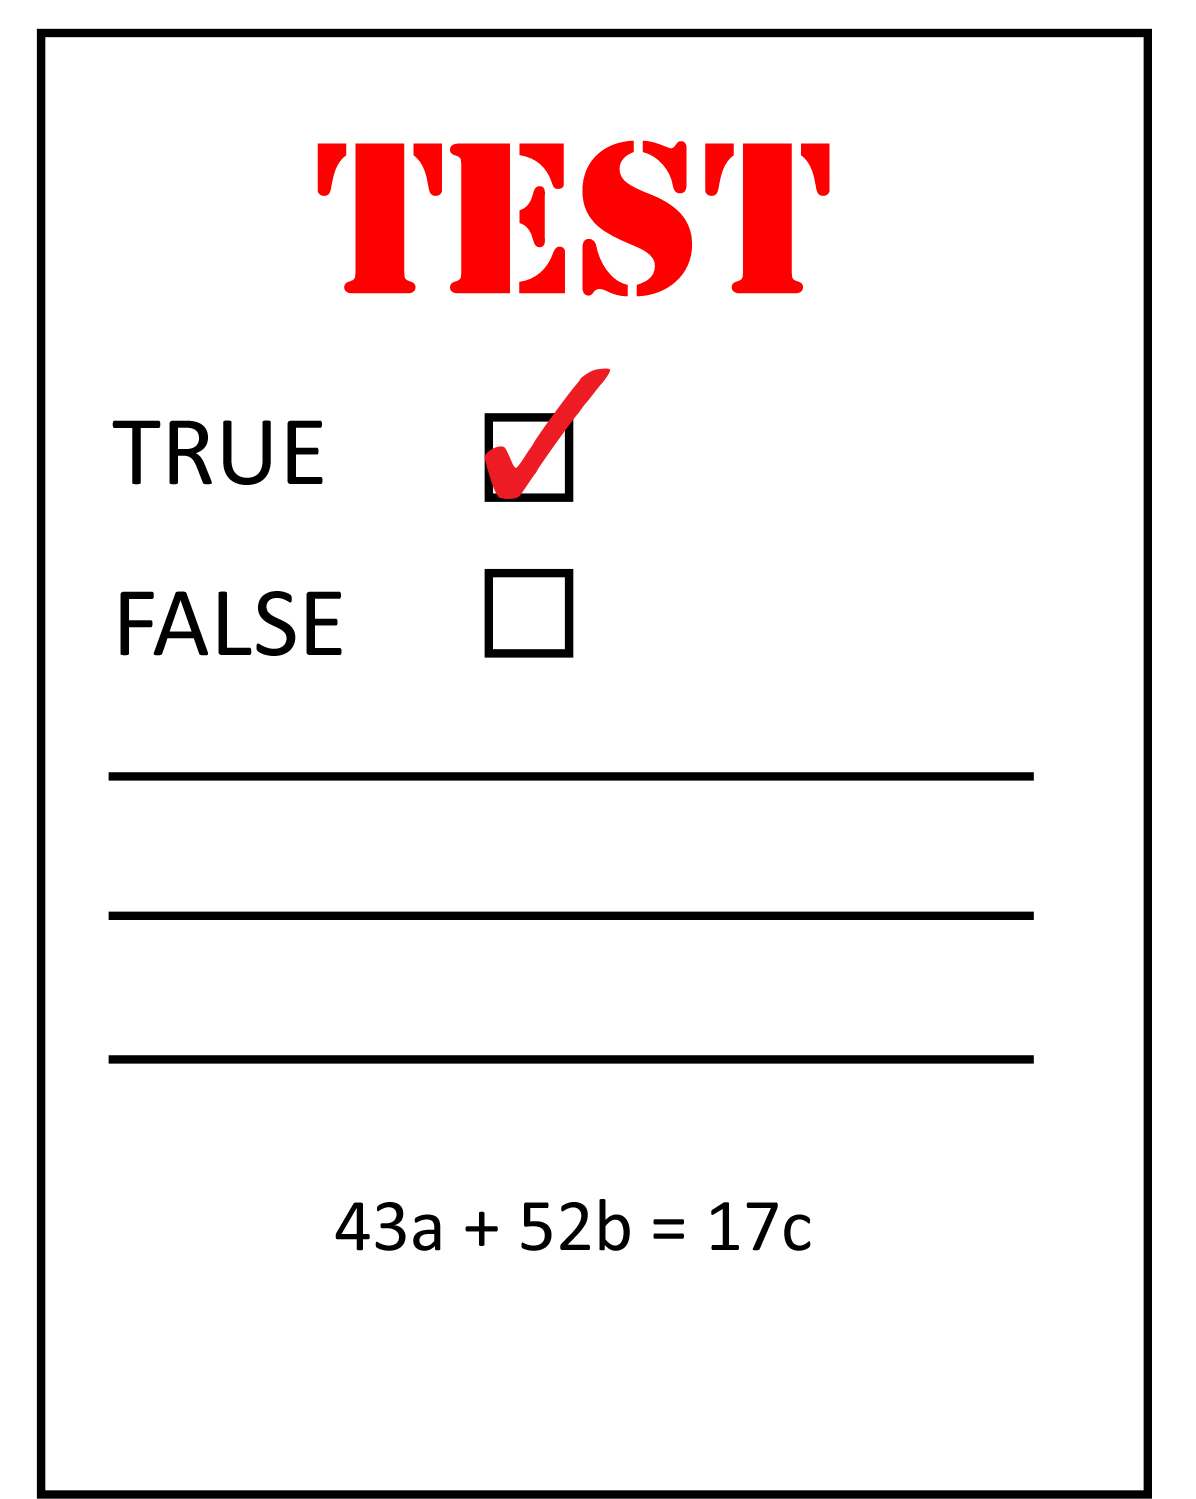 Testing Graphic